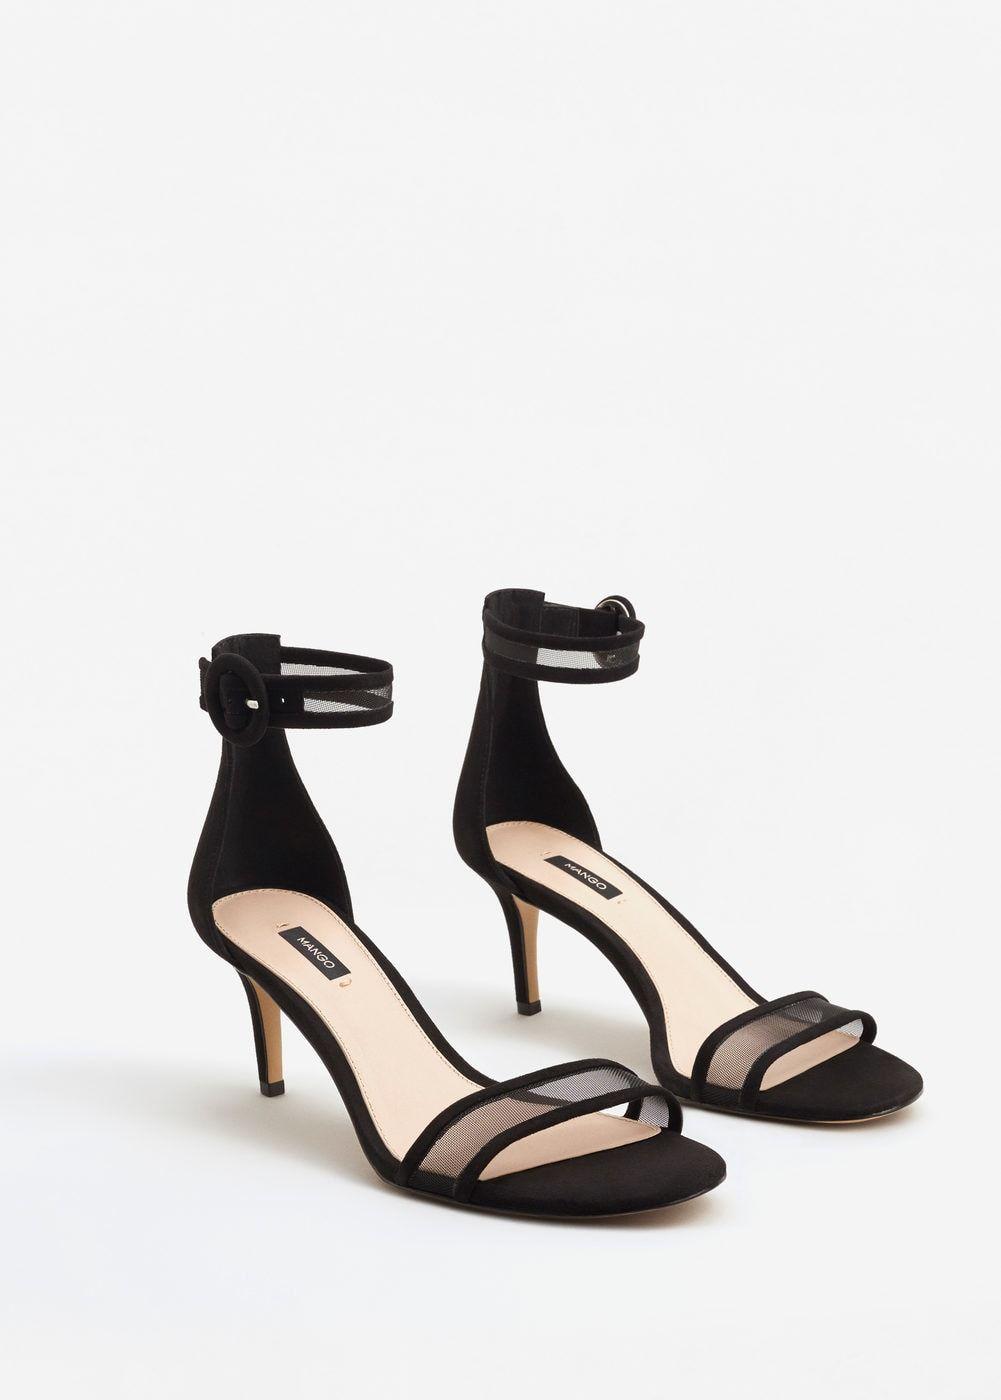 e9e9e284 Sandalia pulsera tobillo - Mujer en 2019 | ropa compras | Zapatos ...